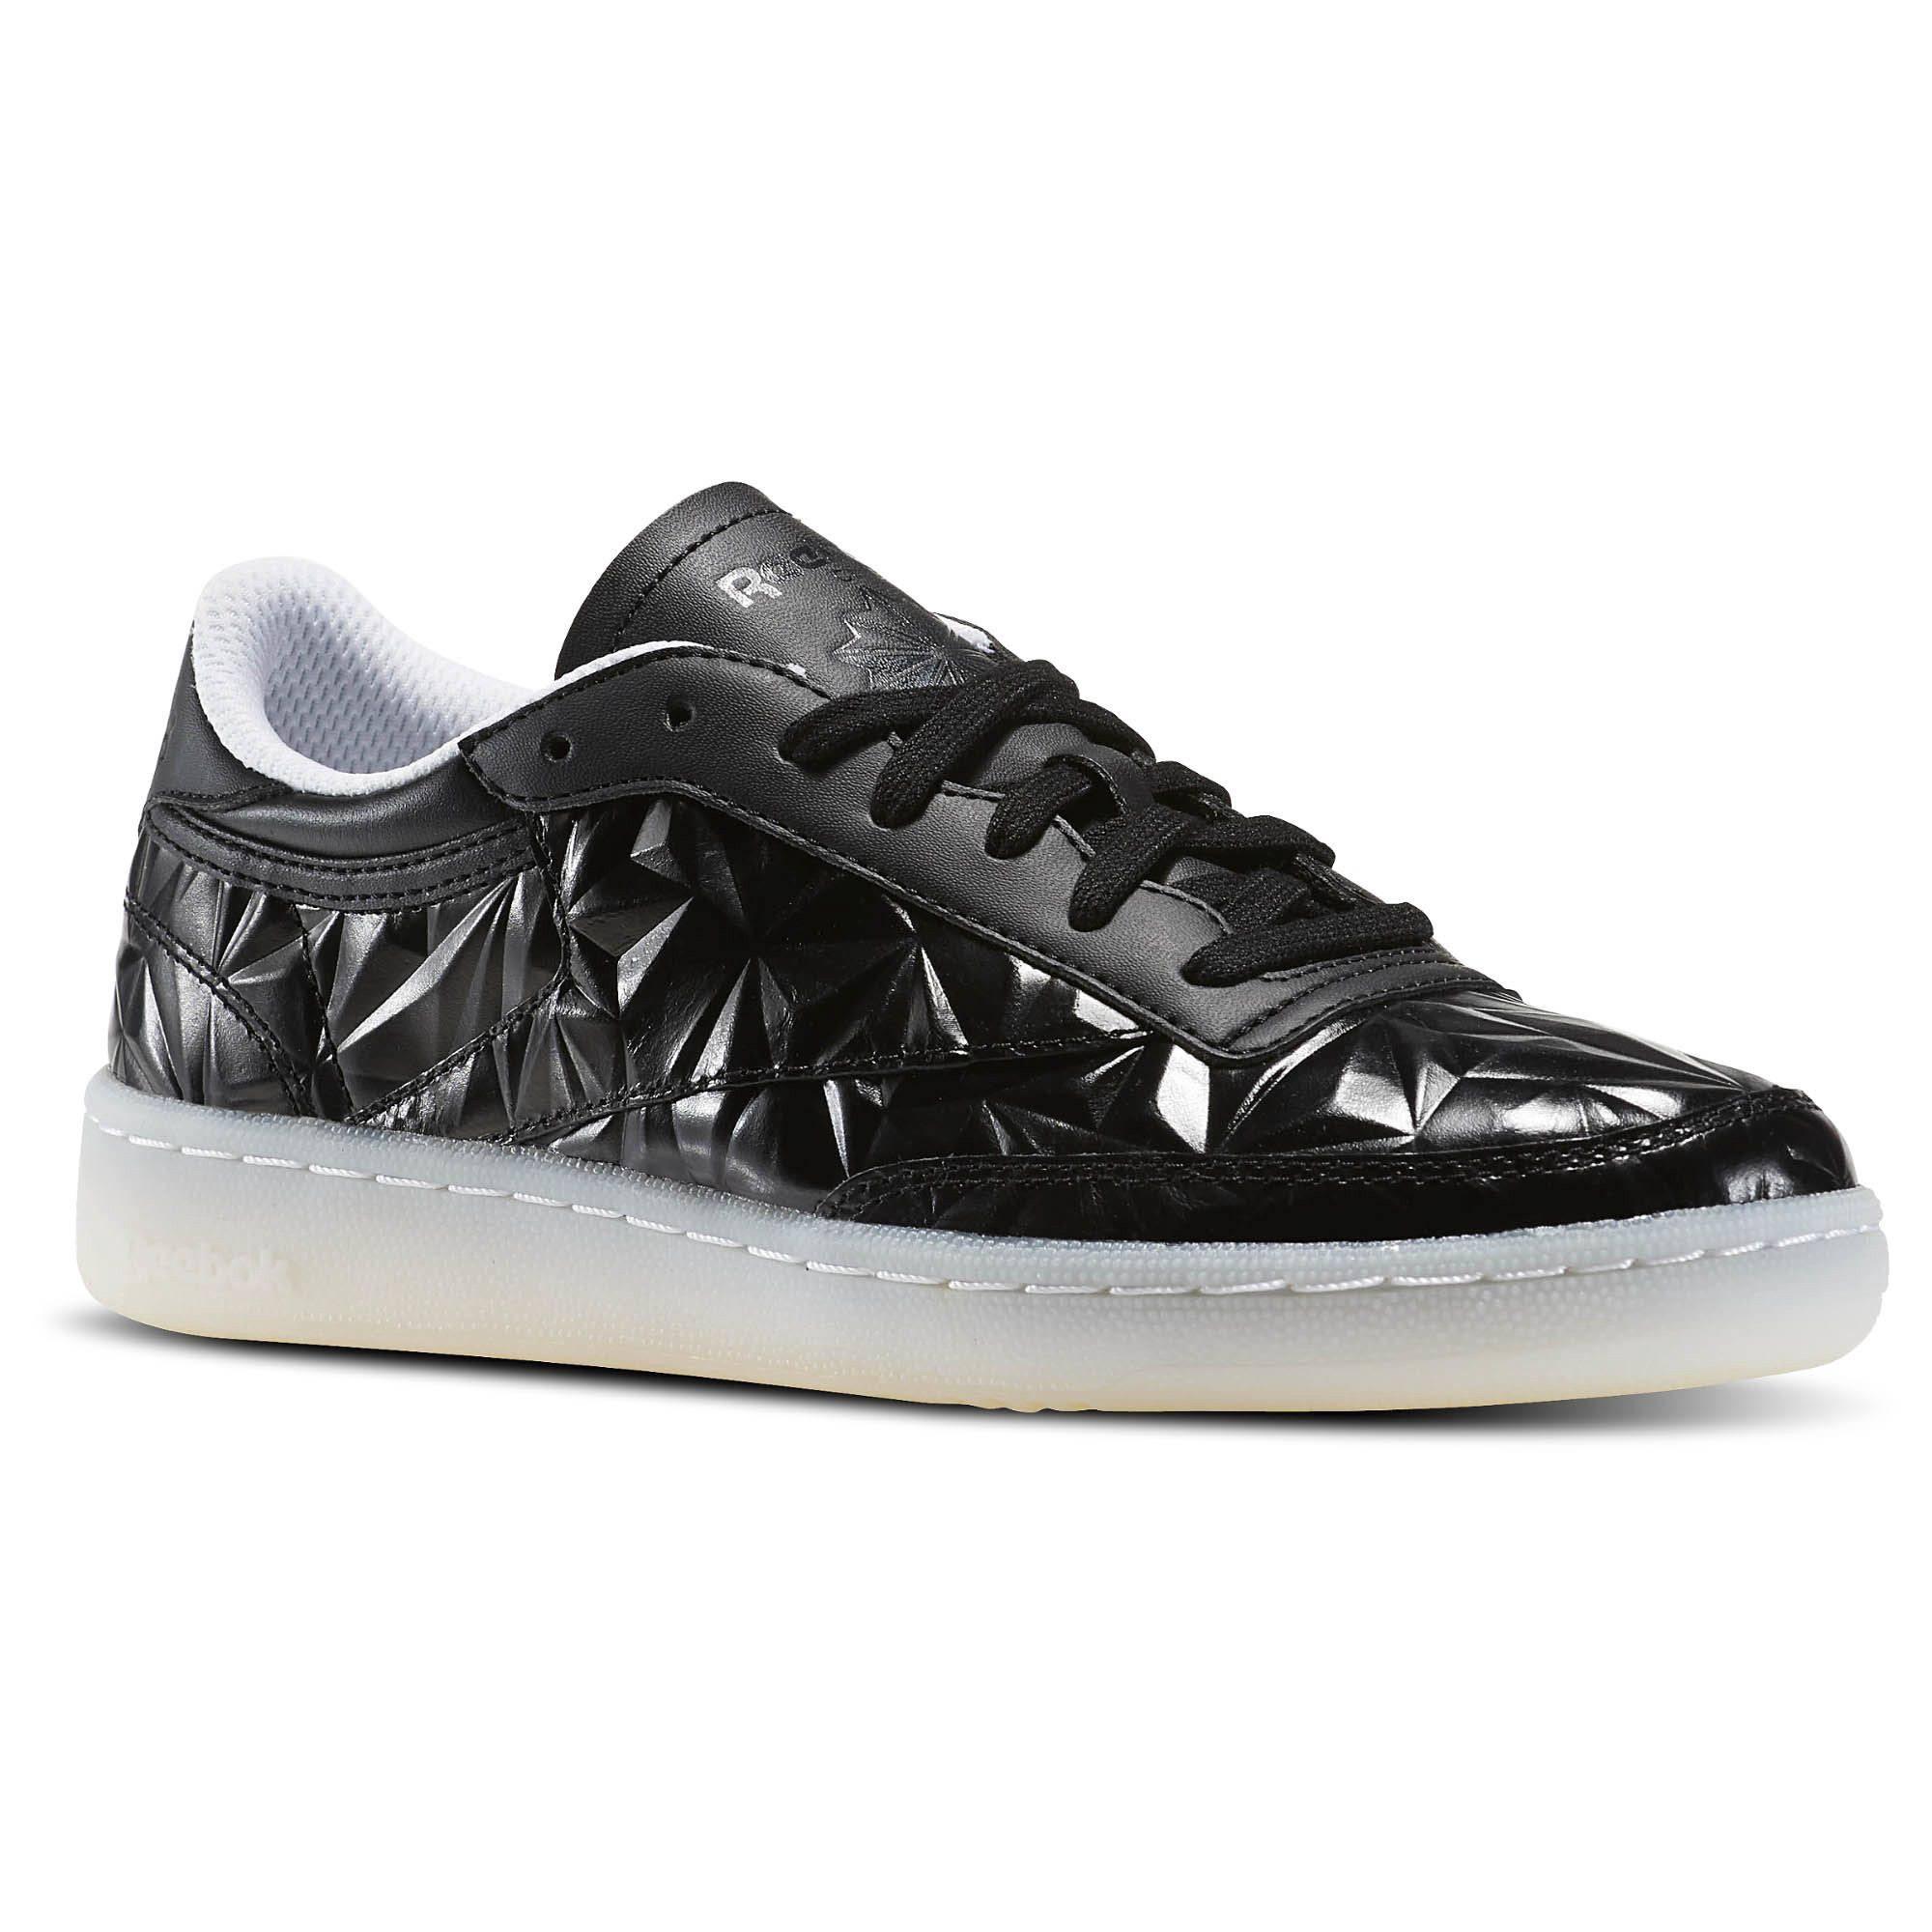 5 C Zapatos Tamaño Club De 85 Blanco Bd4889 Reebok Mujer Negro 4xCOqp8wC